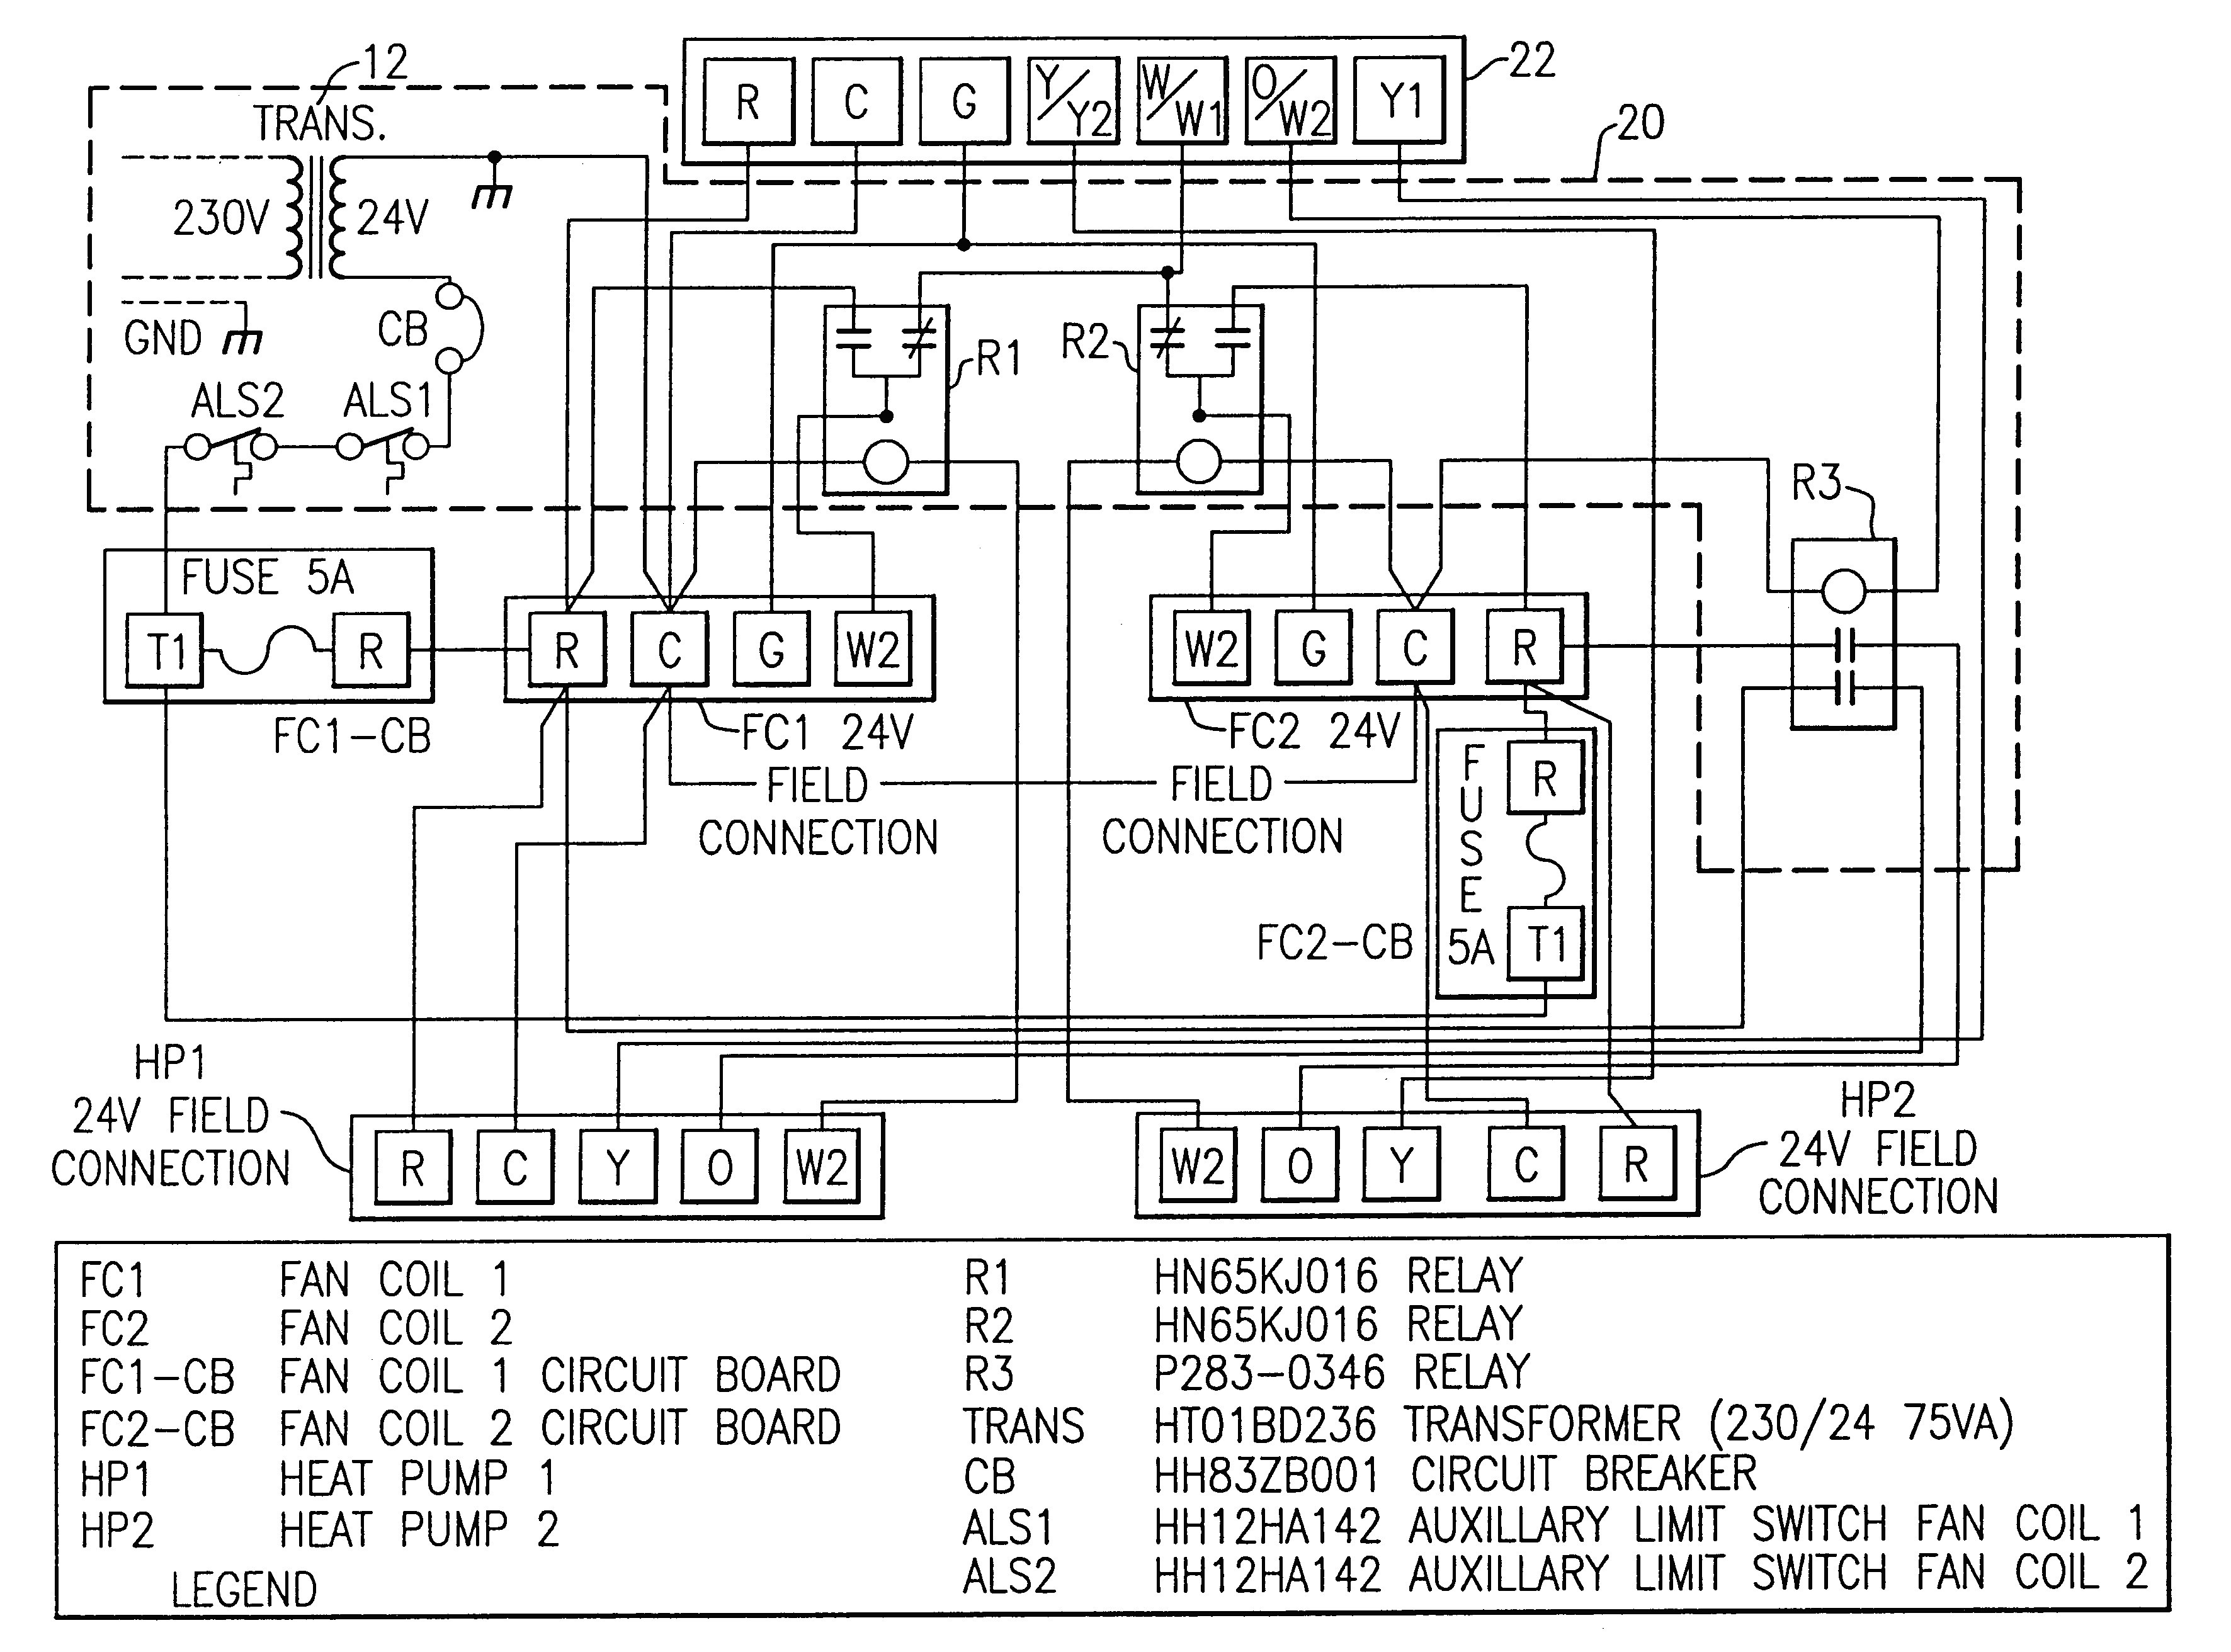 furnace blower motor wiring diagram Download-Furnace Blower Motor Wiring Diagram Inspirational Blower Motor Wiring Diagram Inspirational Furnace Blower Motor 2-r